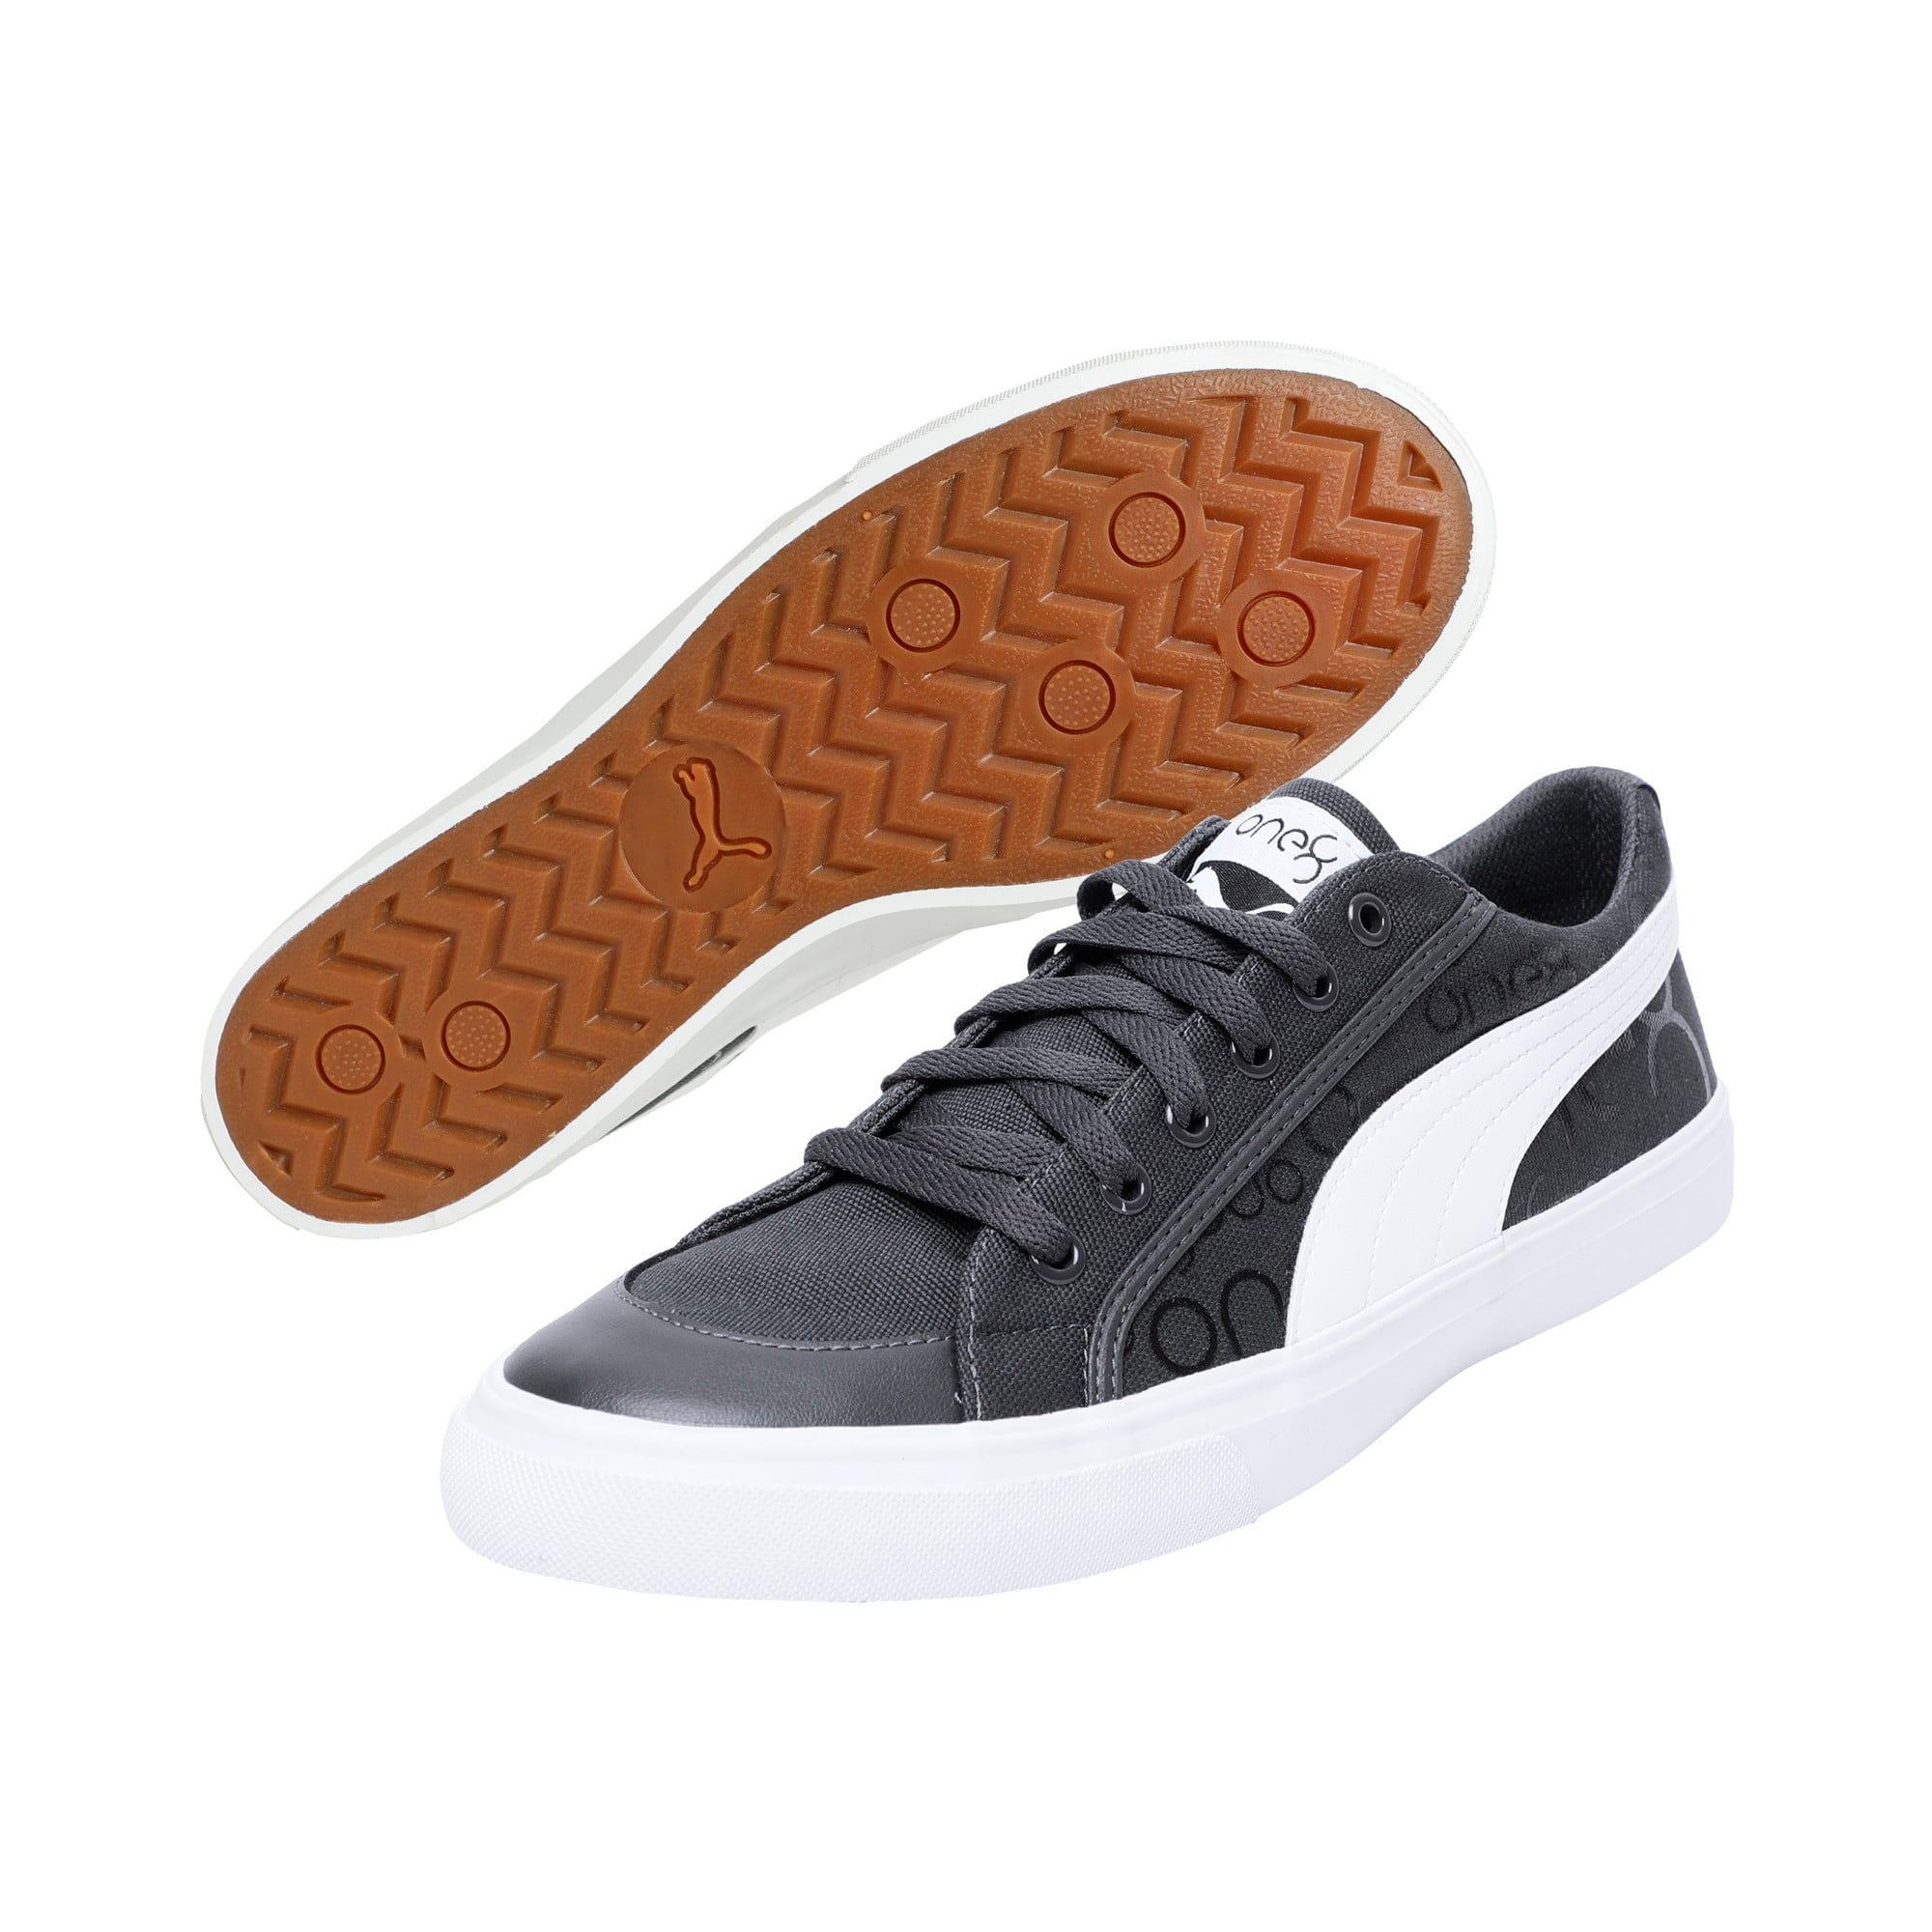 Thumbnail 2 of one8 Men's Sneakers, Iron Gate-Puma White-Black, medium-IND